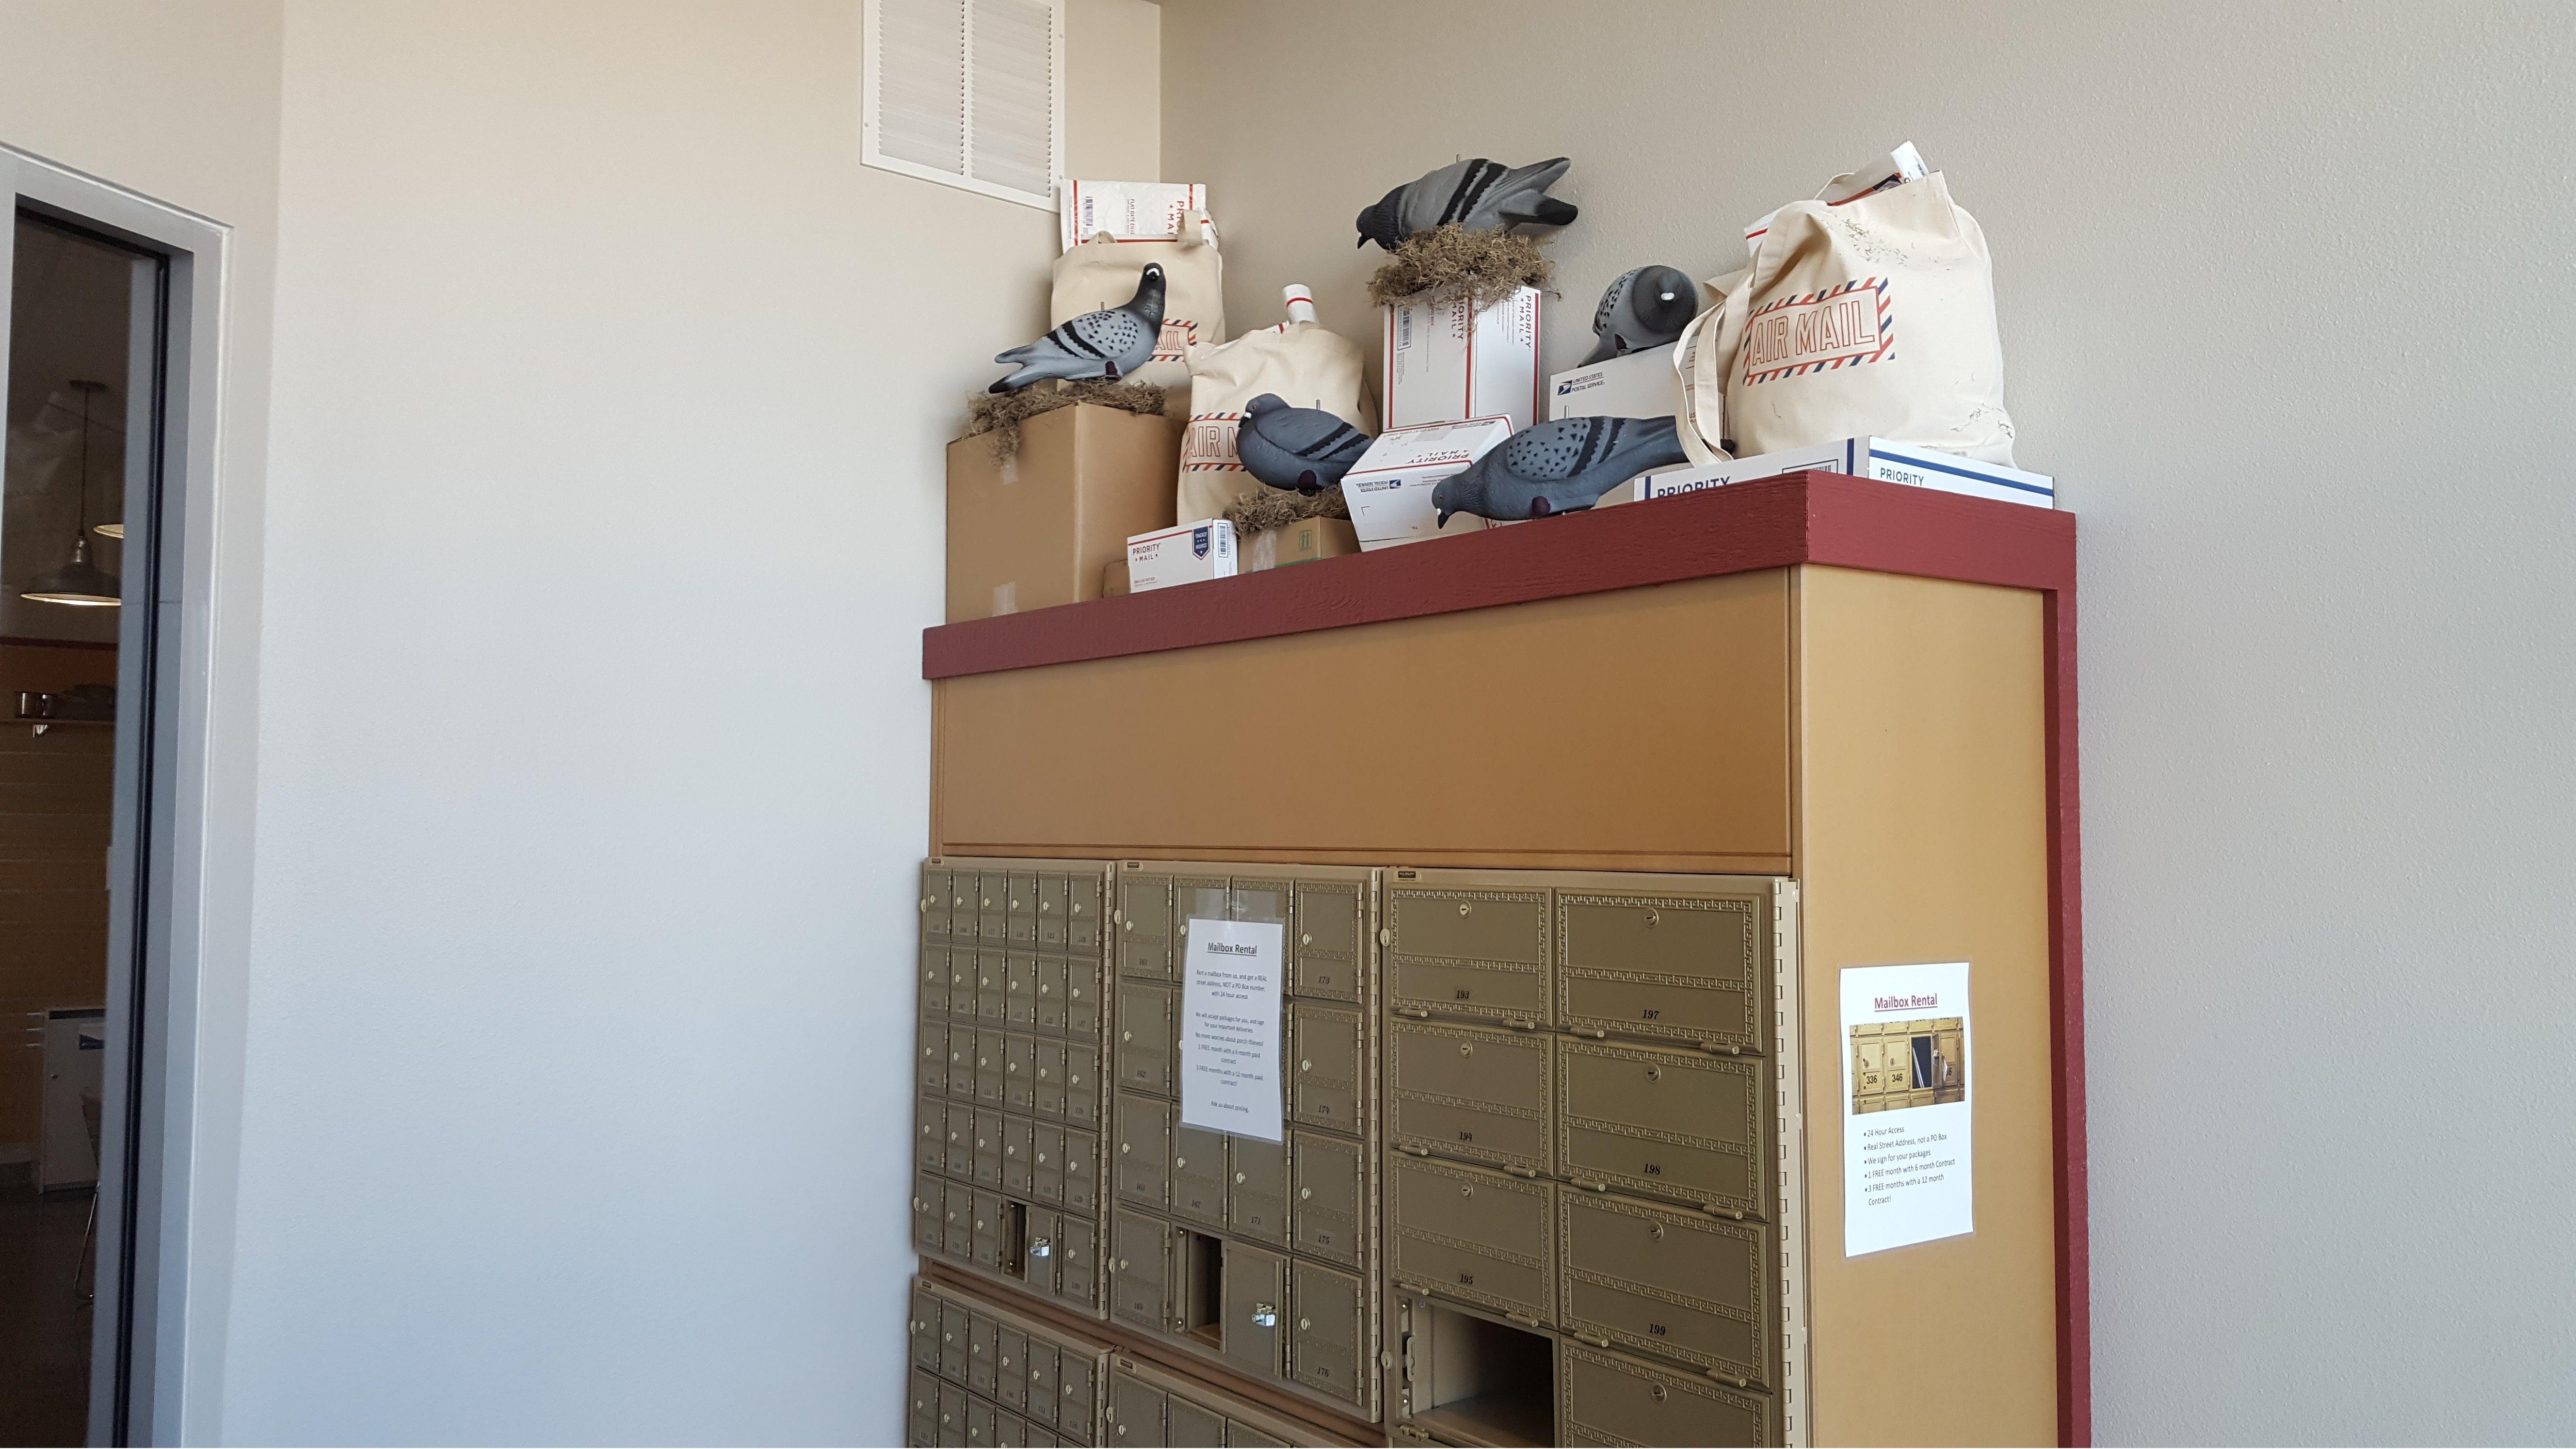 Red Aero Pack Mail Ship image 3